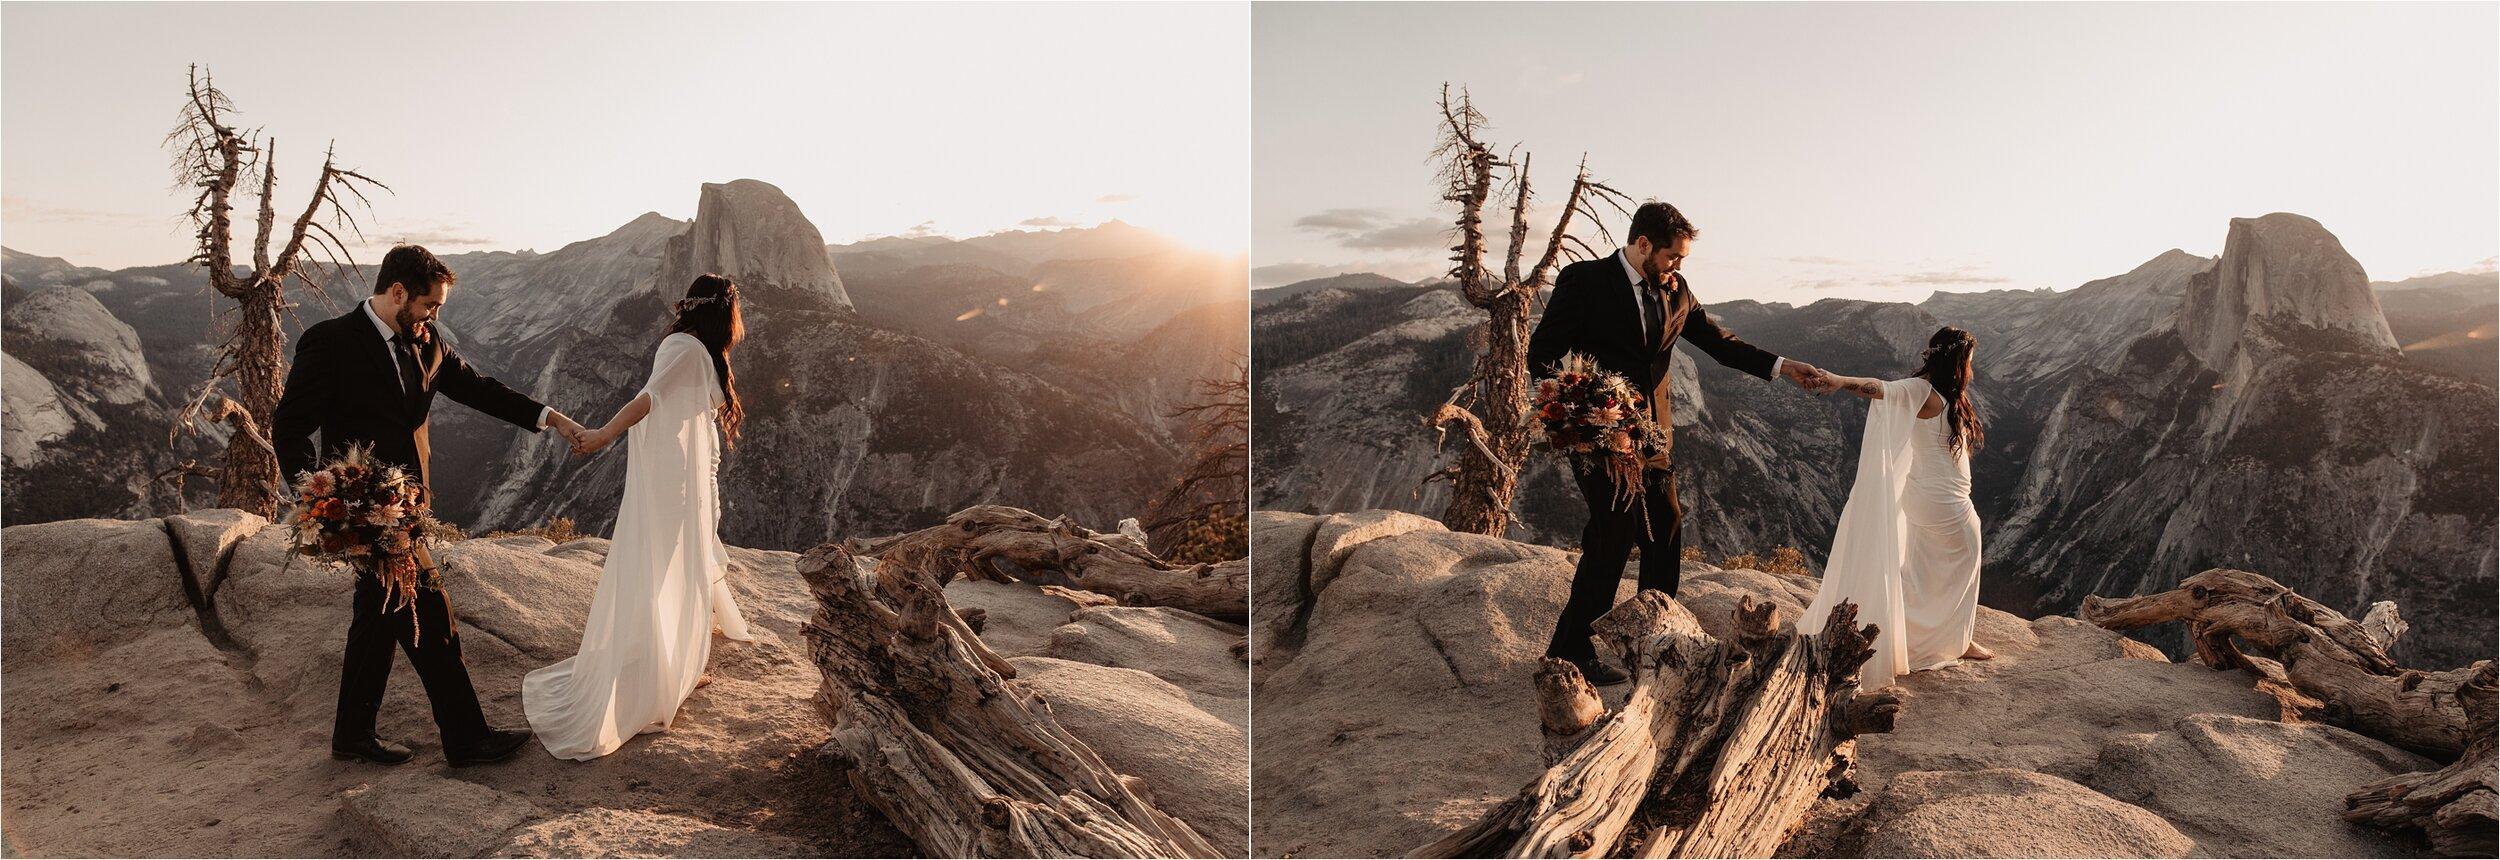 glacier-point-yosemite-elopement-ceremony_0023.jpg